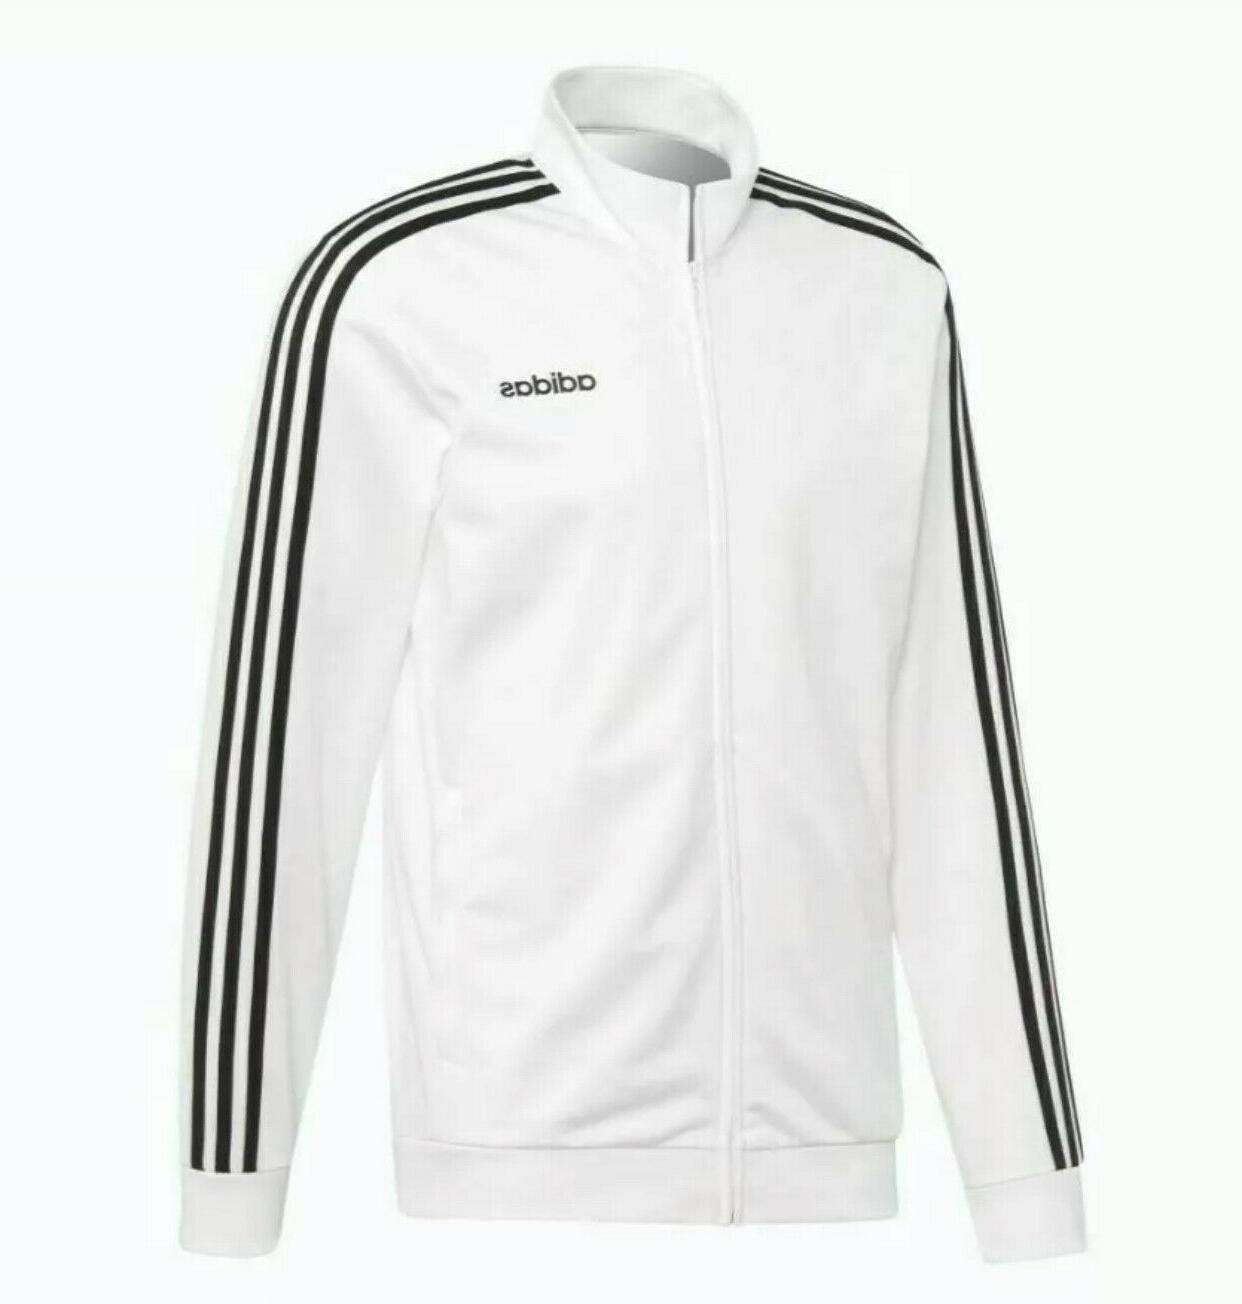 NWT Adidas EB3989